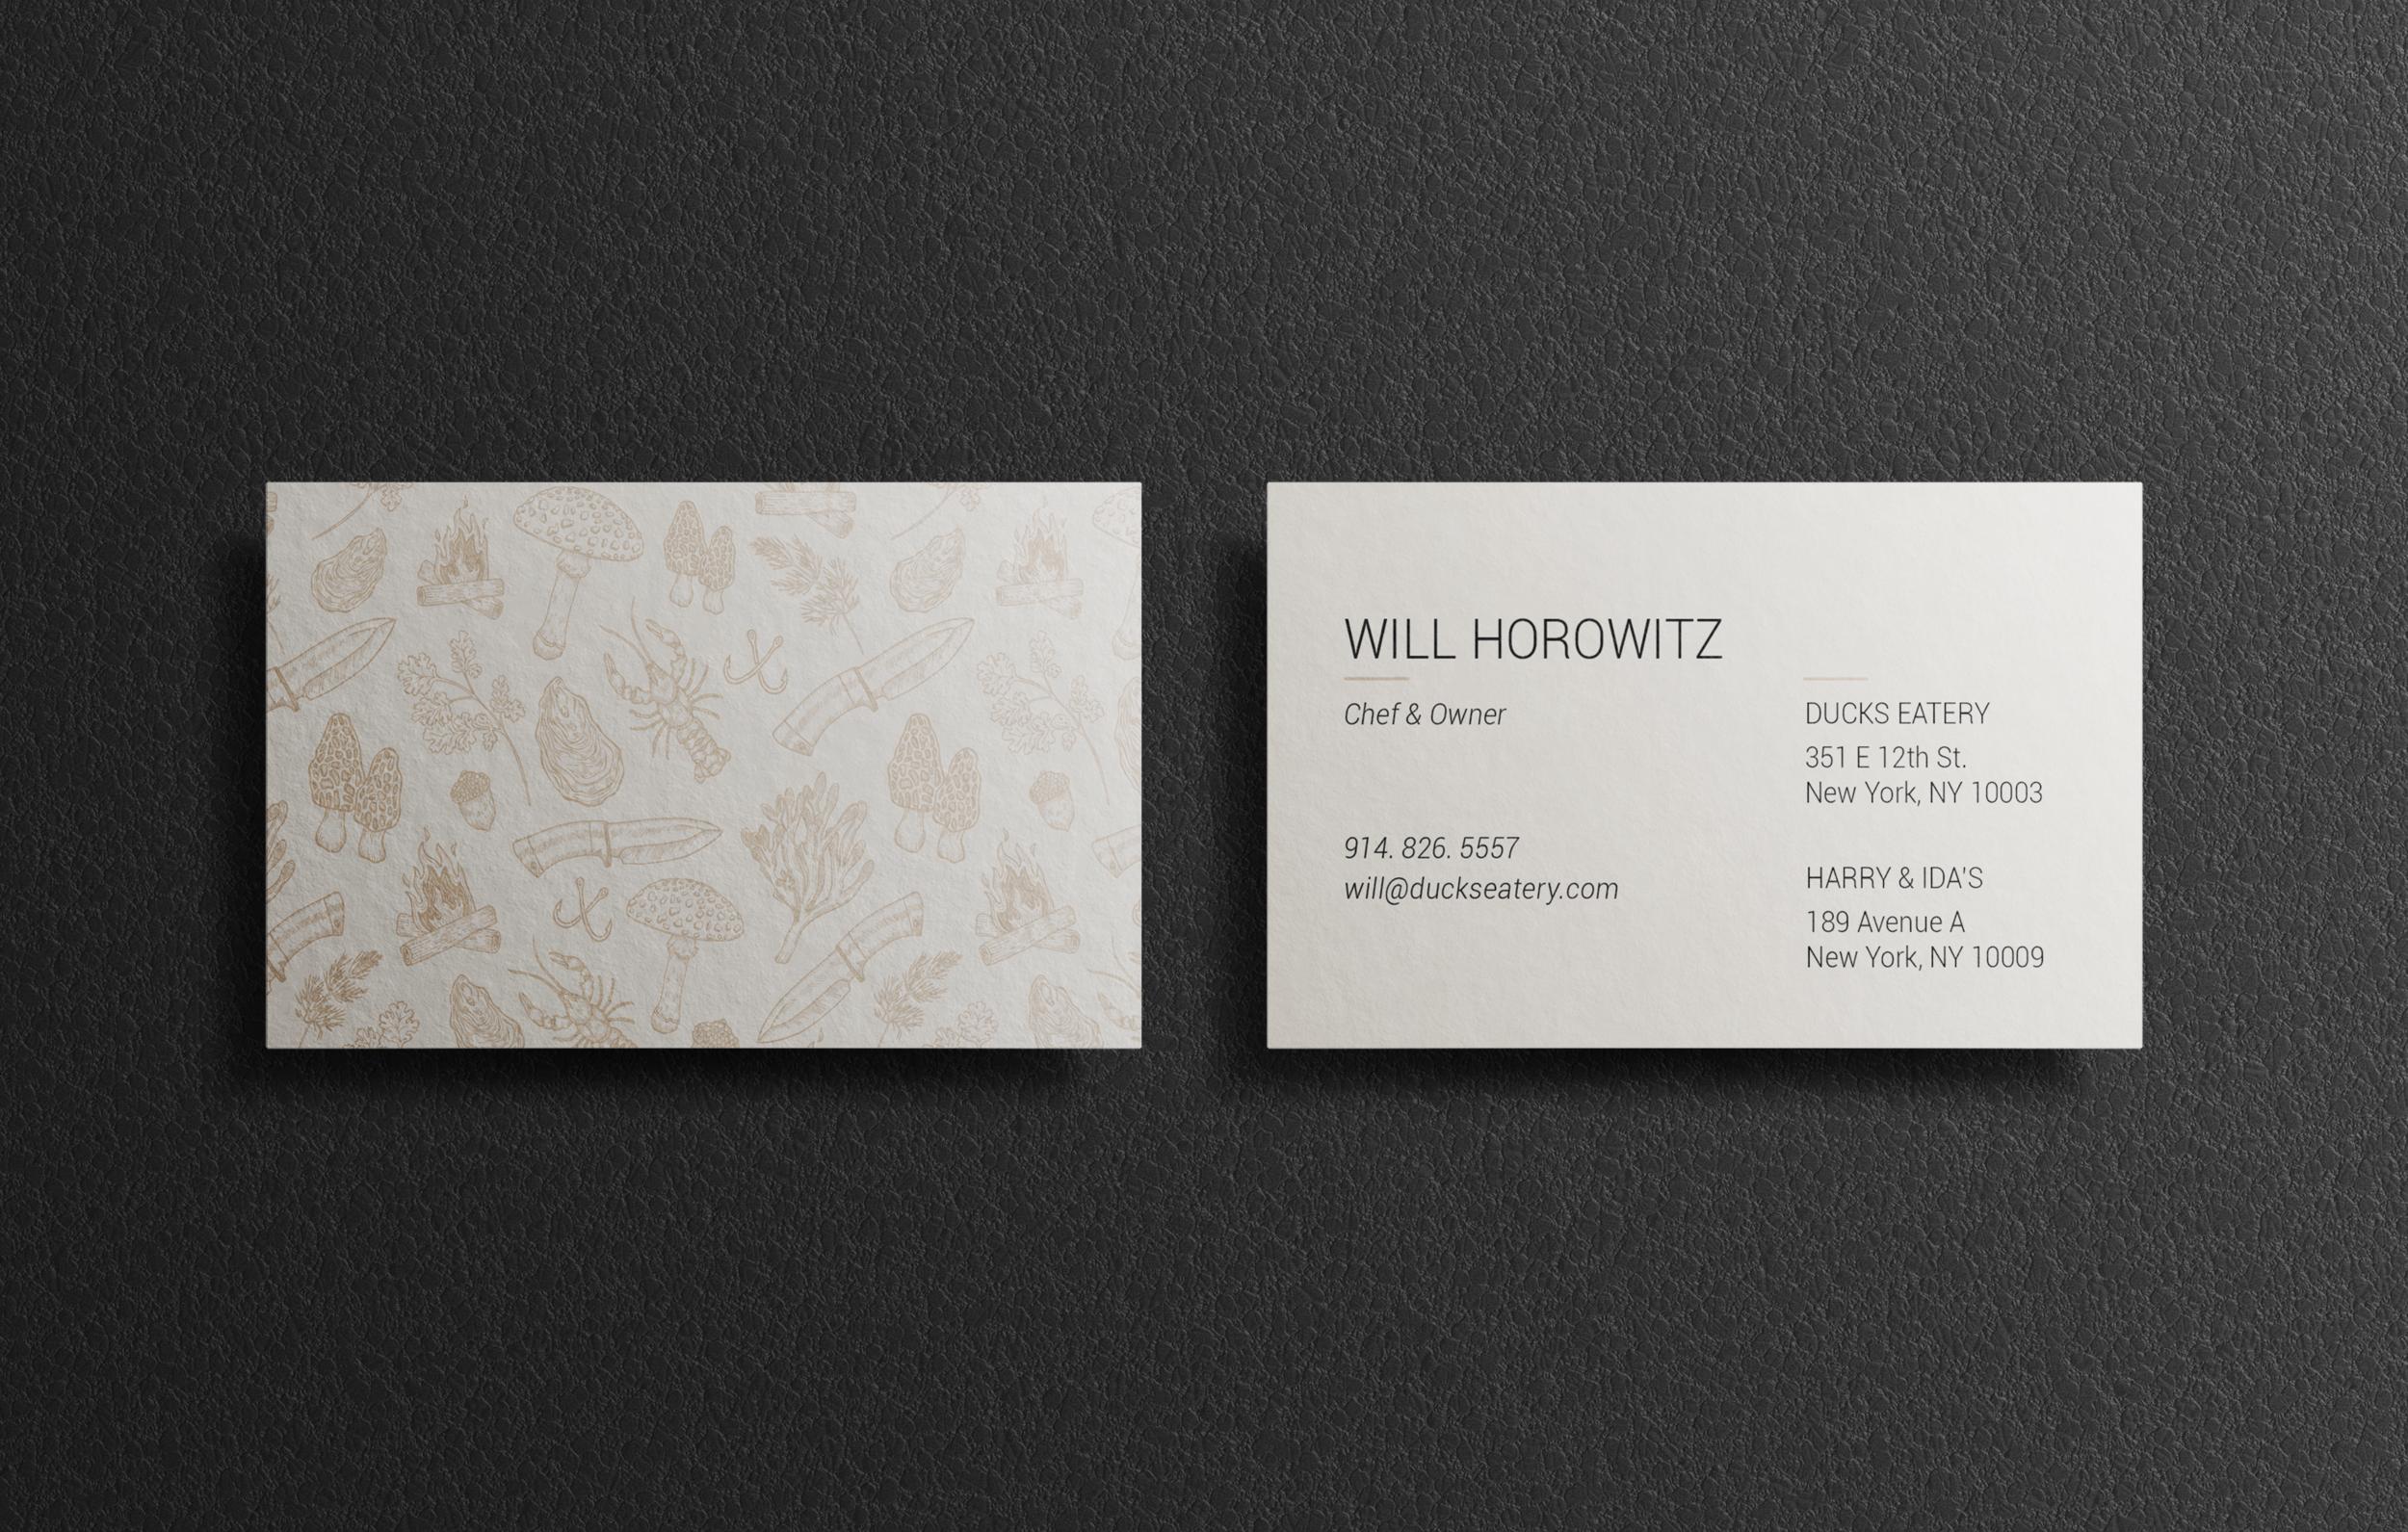 Wills Biz Card Mock Up.png